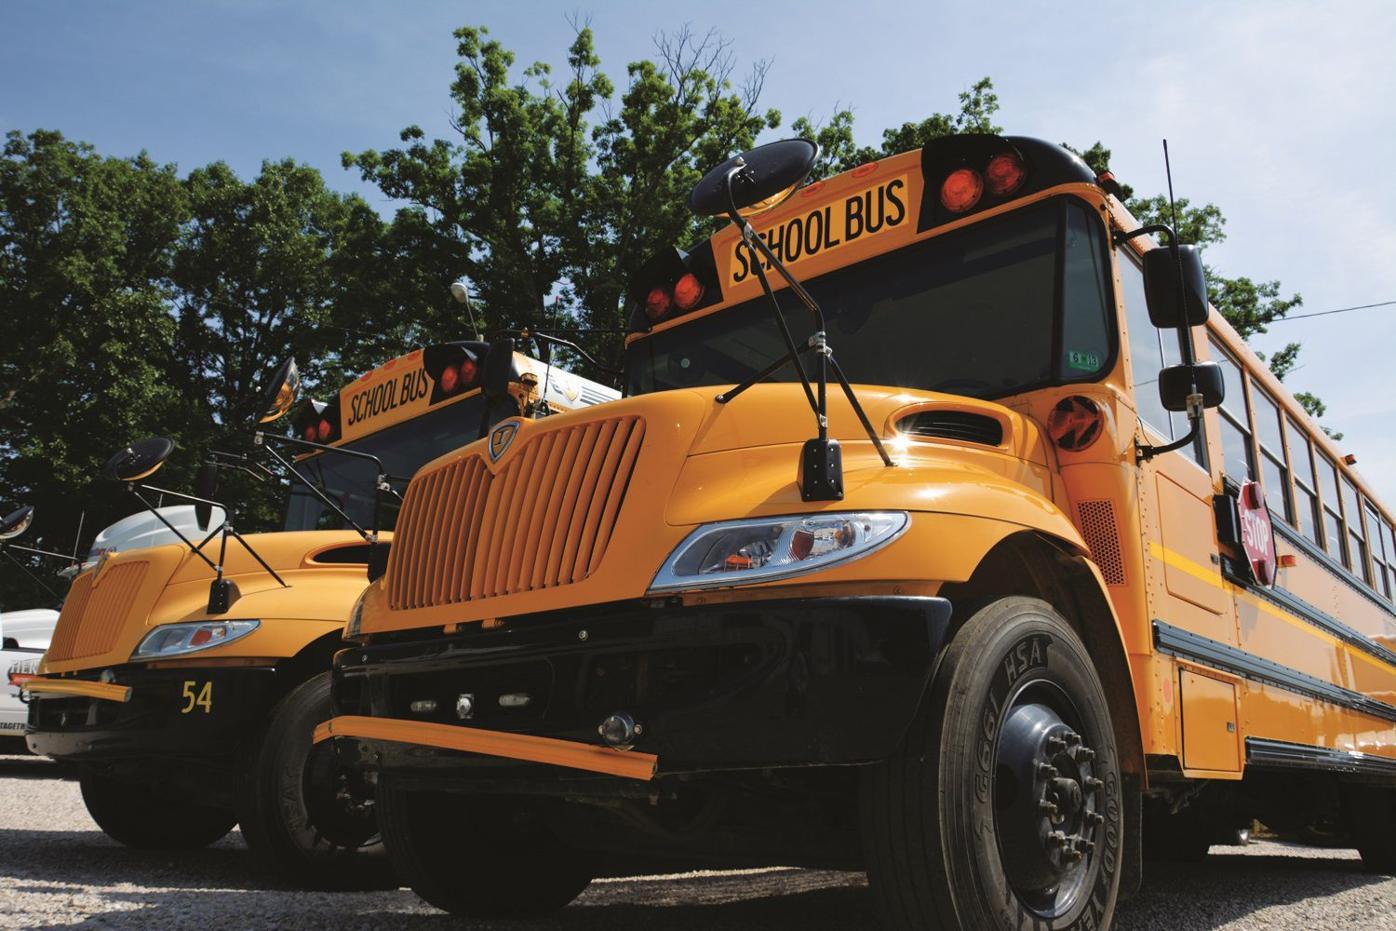 IC CE school buses